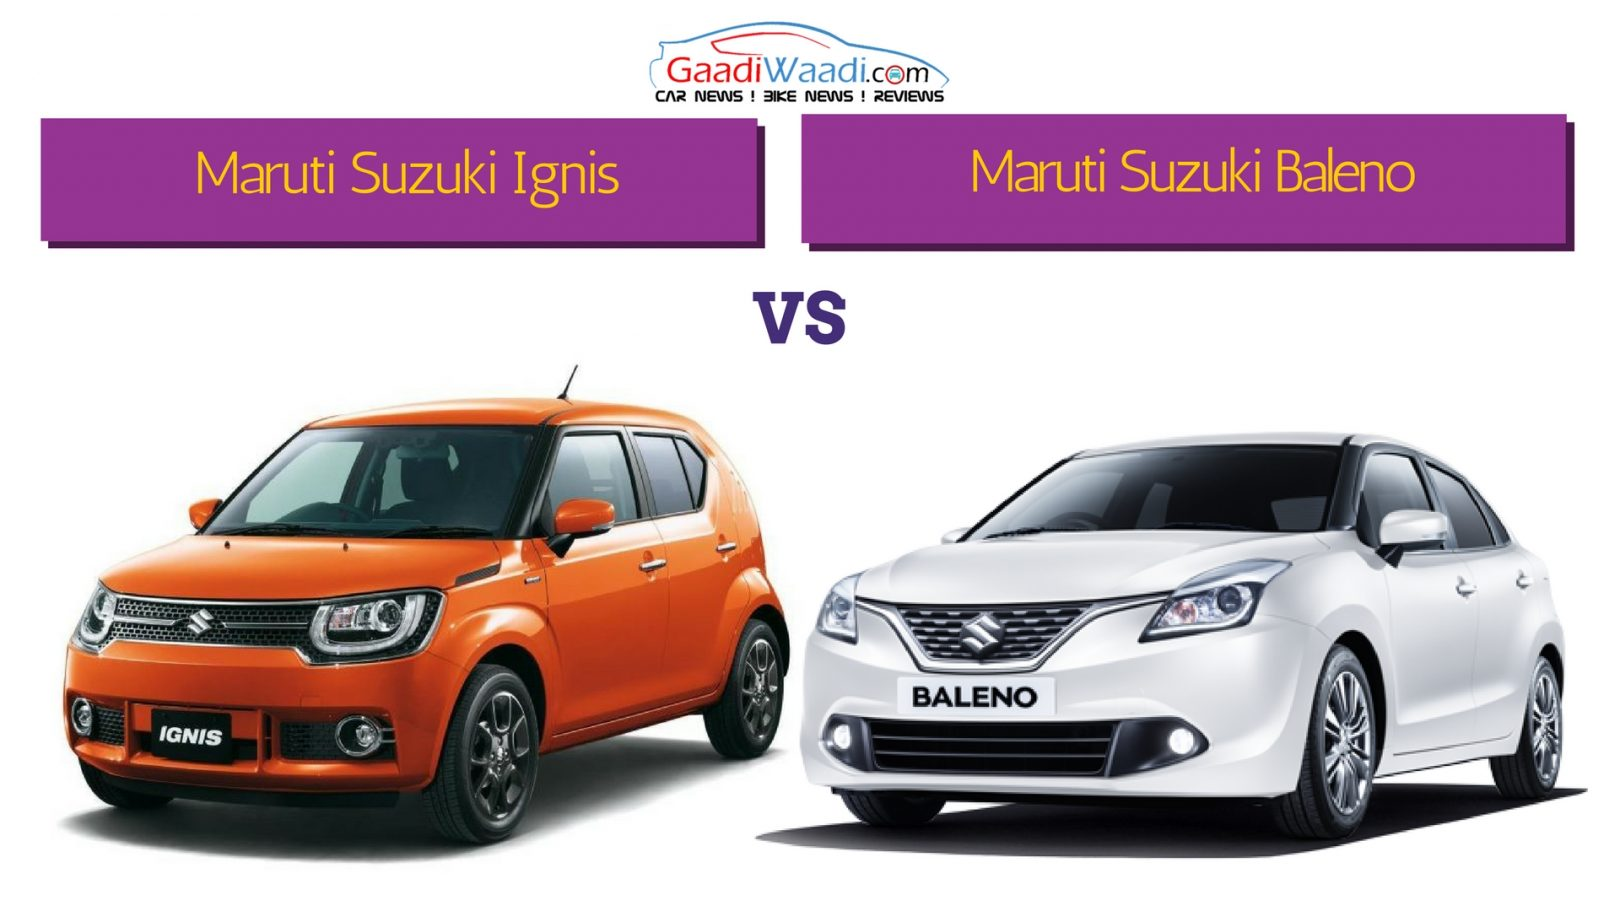 Maruti Suzuki Ignis Vs Maruti Suzuki Baleno Specs Comparison